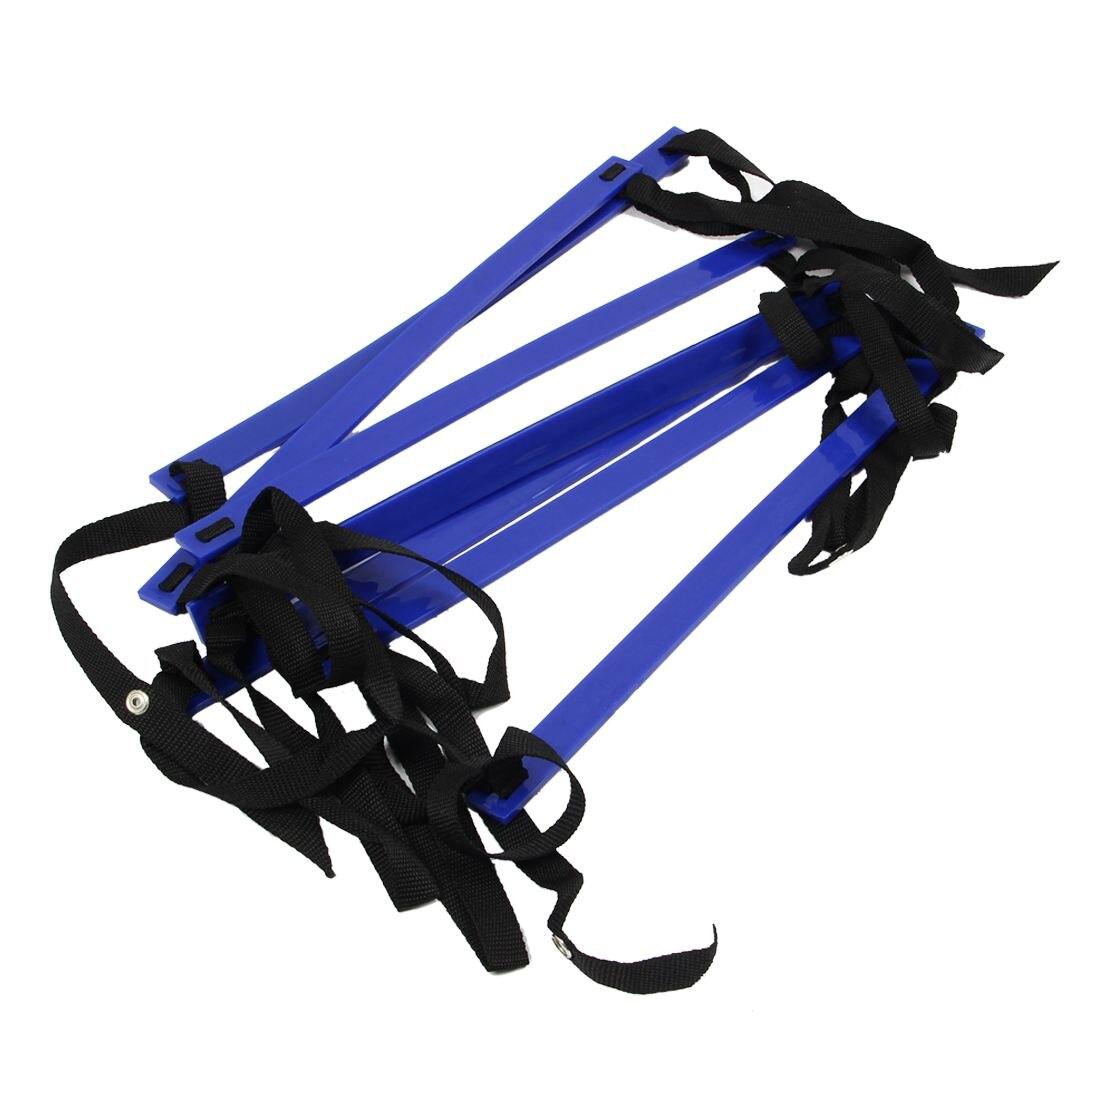 10 Feet Agility Speed Ladder Soccer Training Ladder Quick 7 Flat Rung Speed Ladder